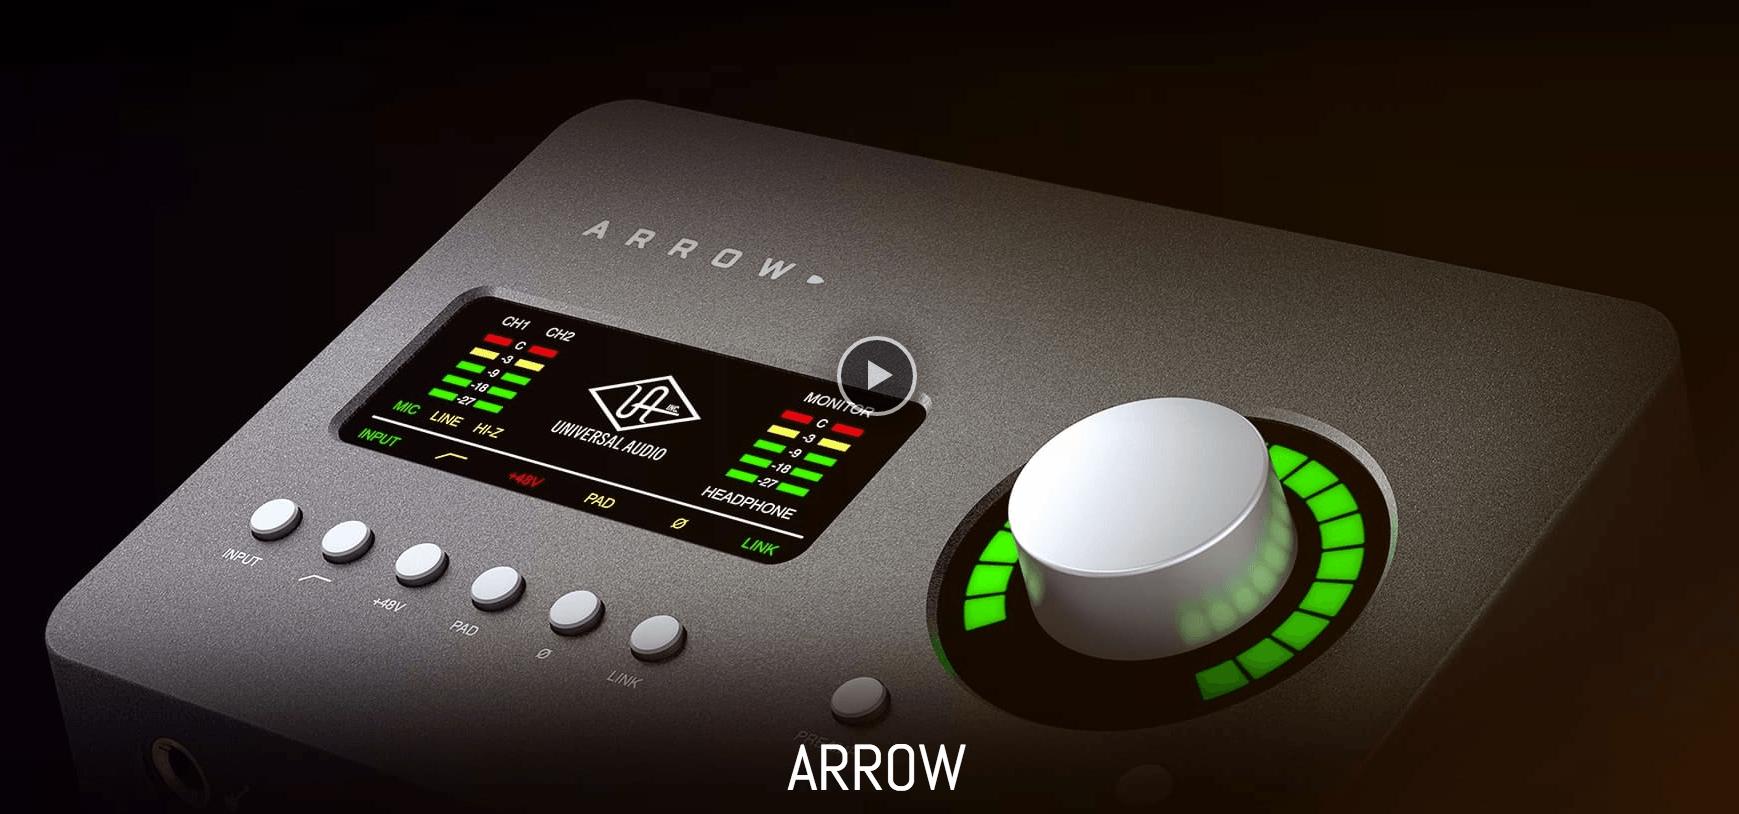 Universal Audio Ships Arrow Desktop Audio Interface For Music Creators